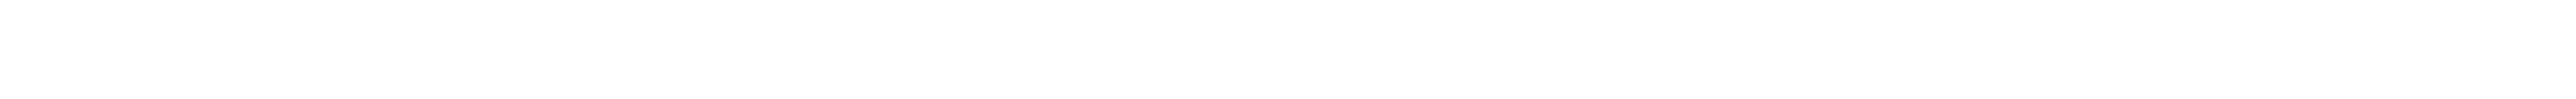 Personen-Notsignal-Anlagen Personennotsignalsystem oscom Deutschland News Skyline lang